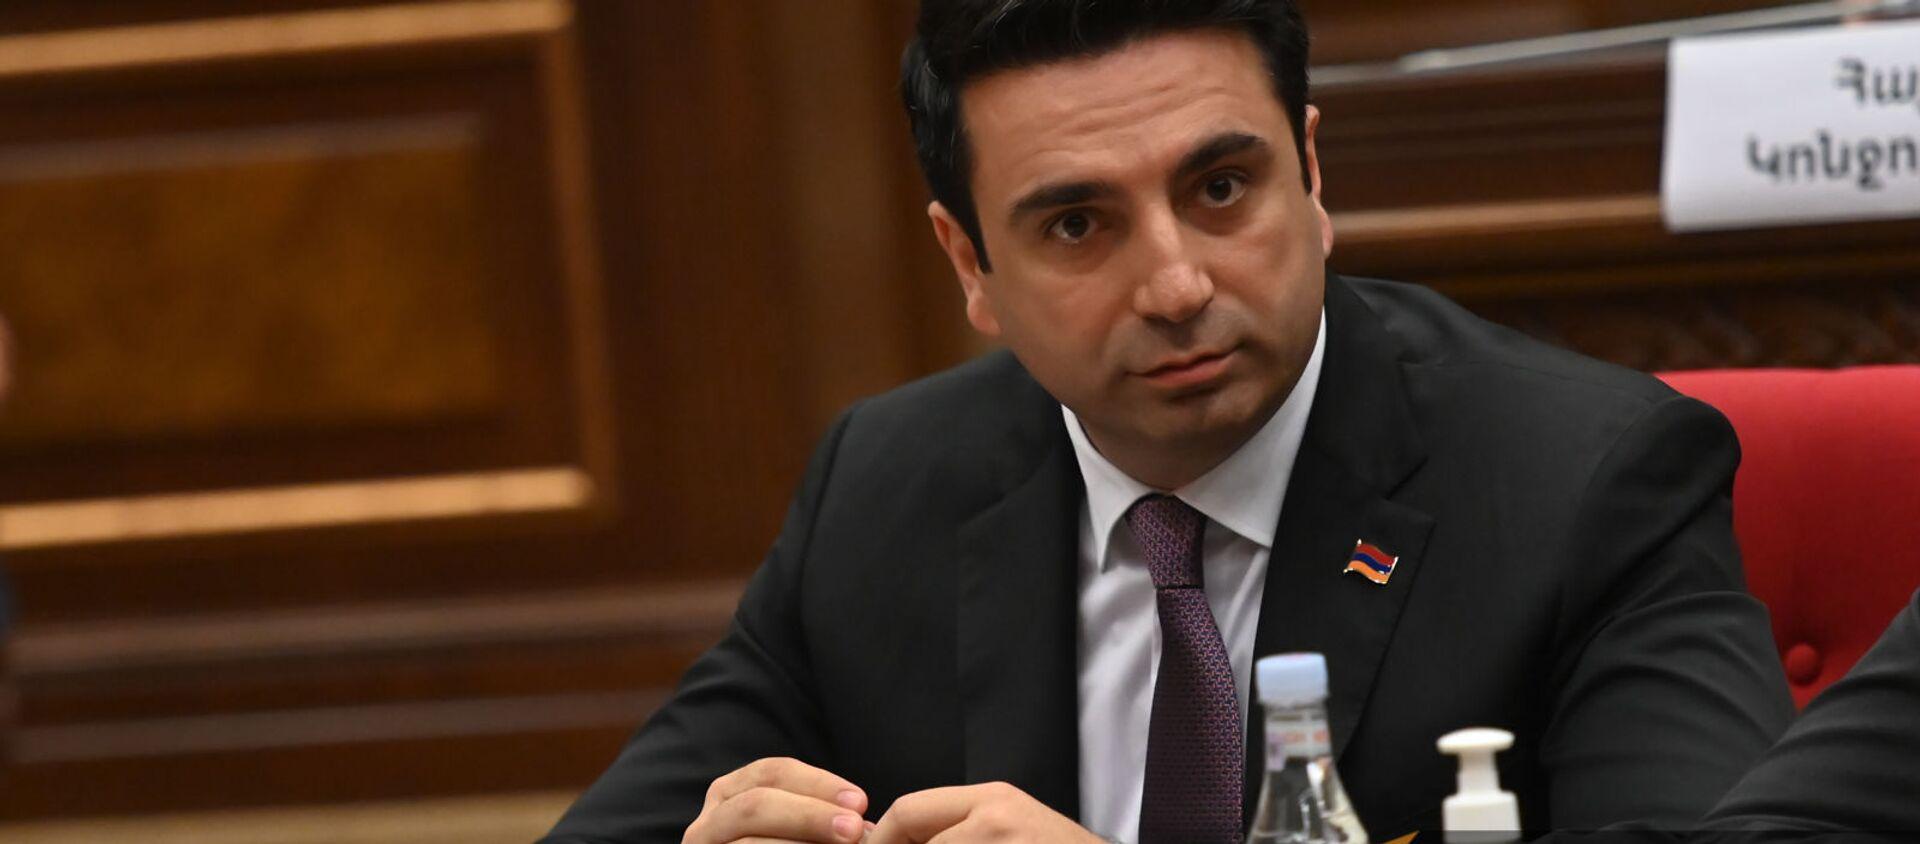 Ален Симонян во время первого заседания парламента Армении 8-го созыва (2 августа 2021). Еревaн - Sputnik Արմենիա, 1920, 23.08.2021